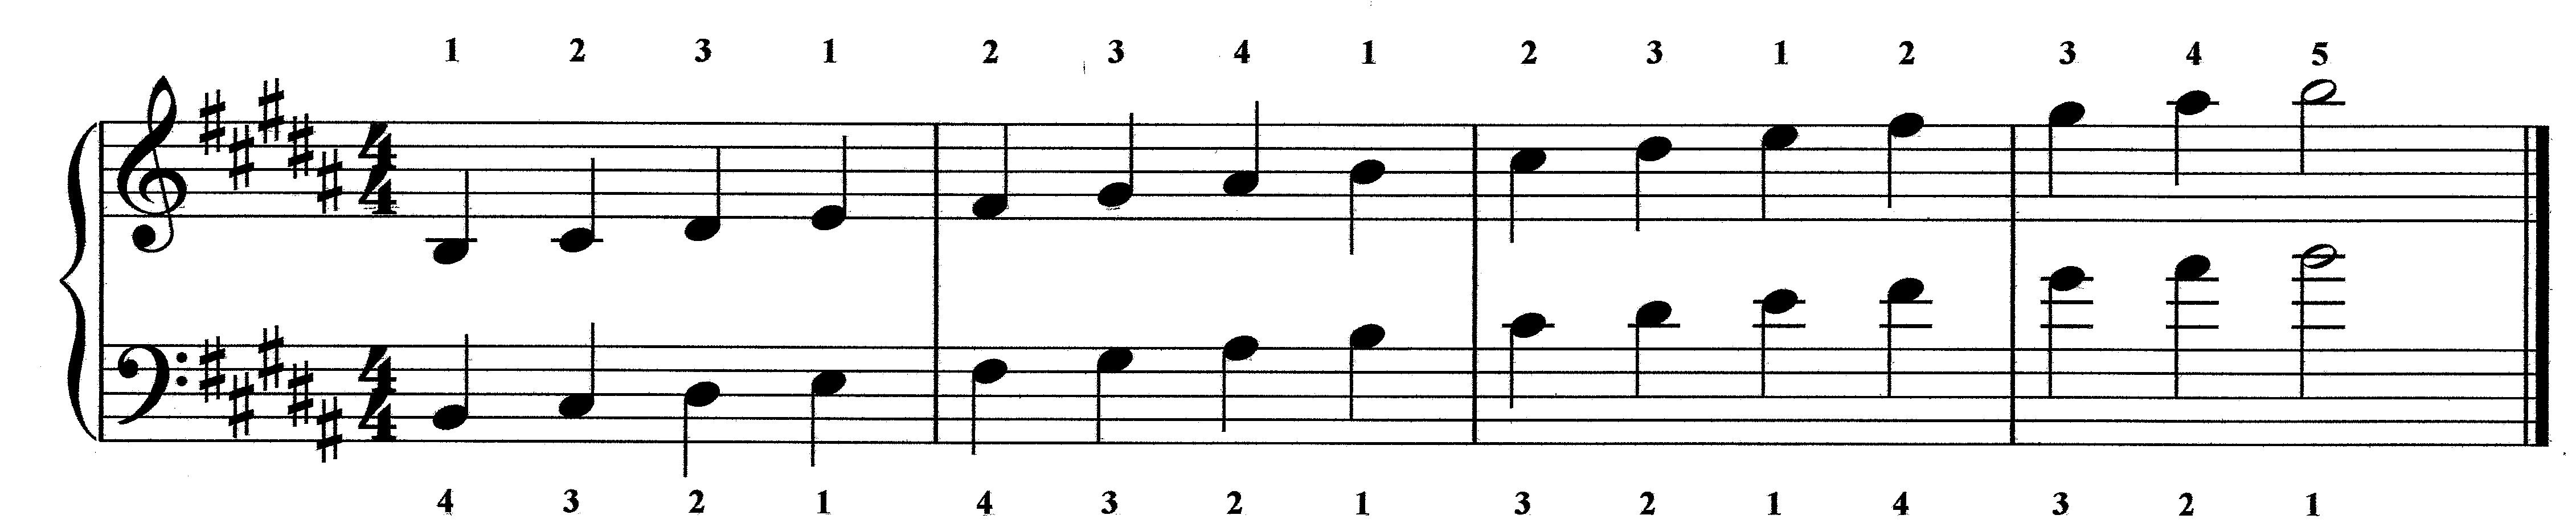 C Major Scale Piano Sheet Music | www.imgkid.com - The ... C Flat Major Scale